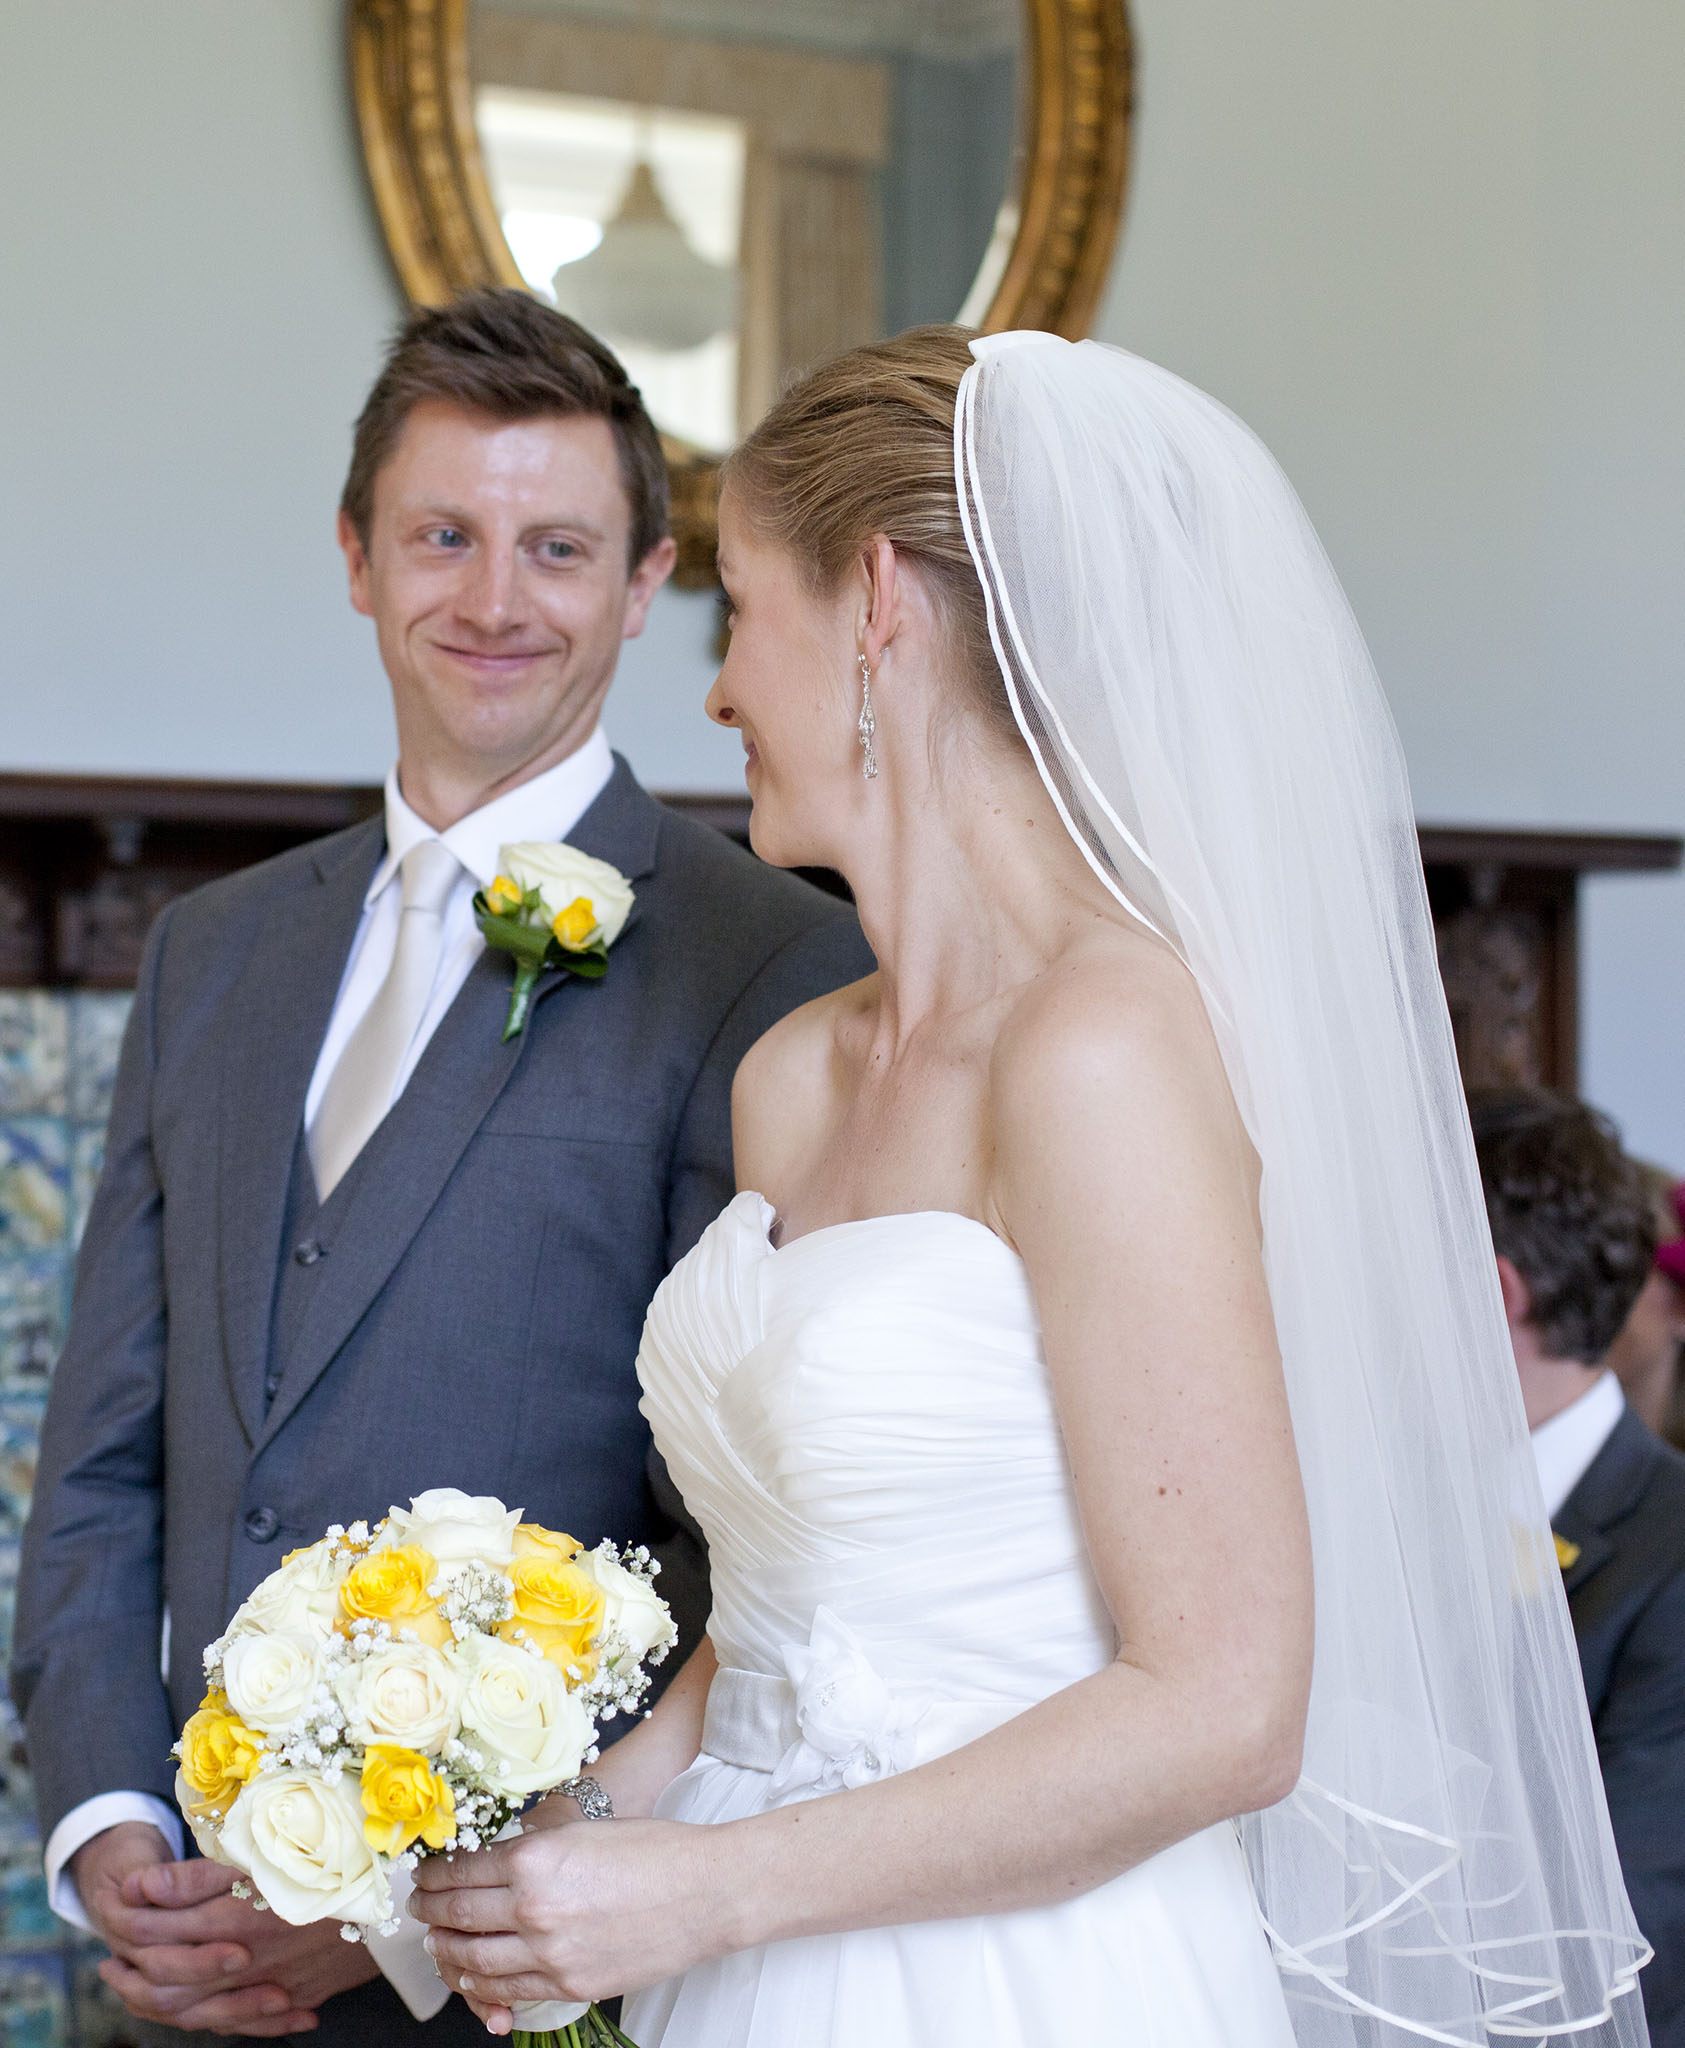 elizabethg_fineart_photography_hertfordshire_rachel_adam_wedding_highelmsmanor_21.jpg